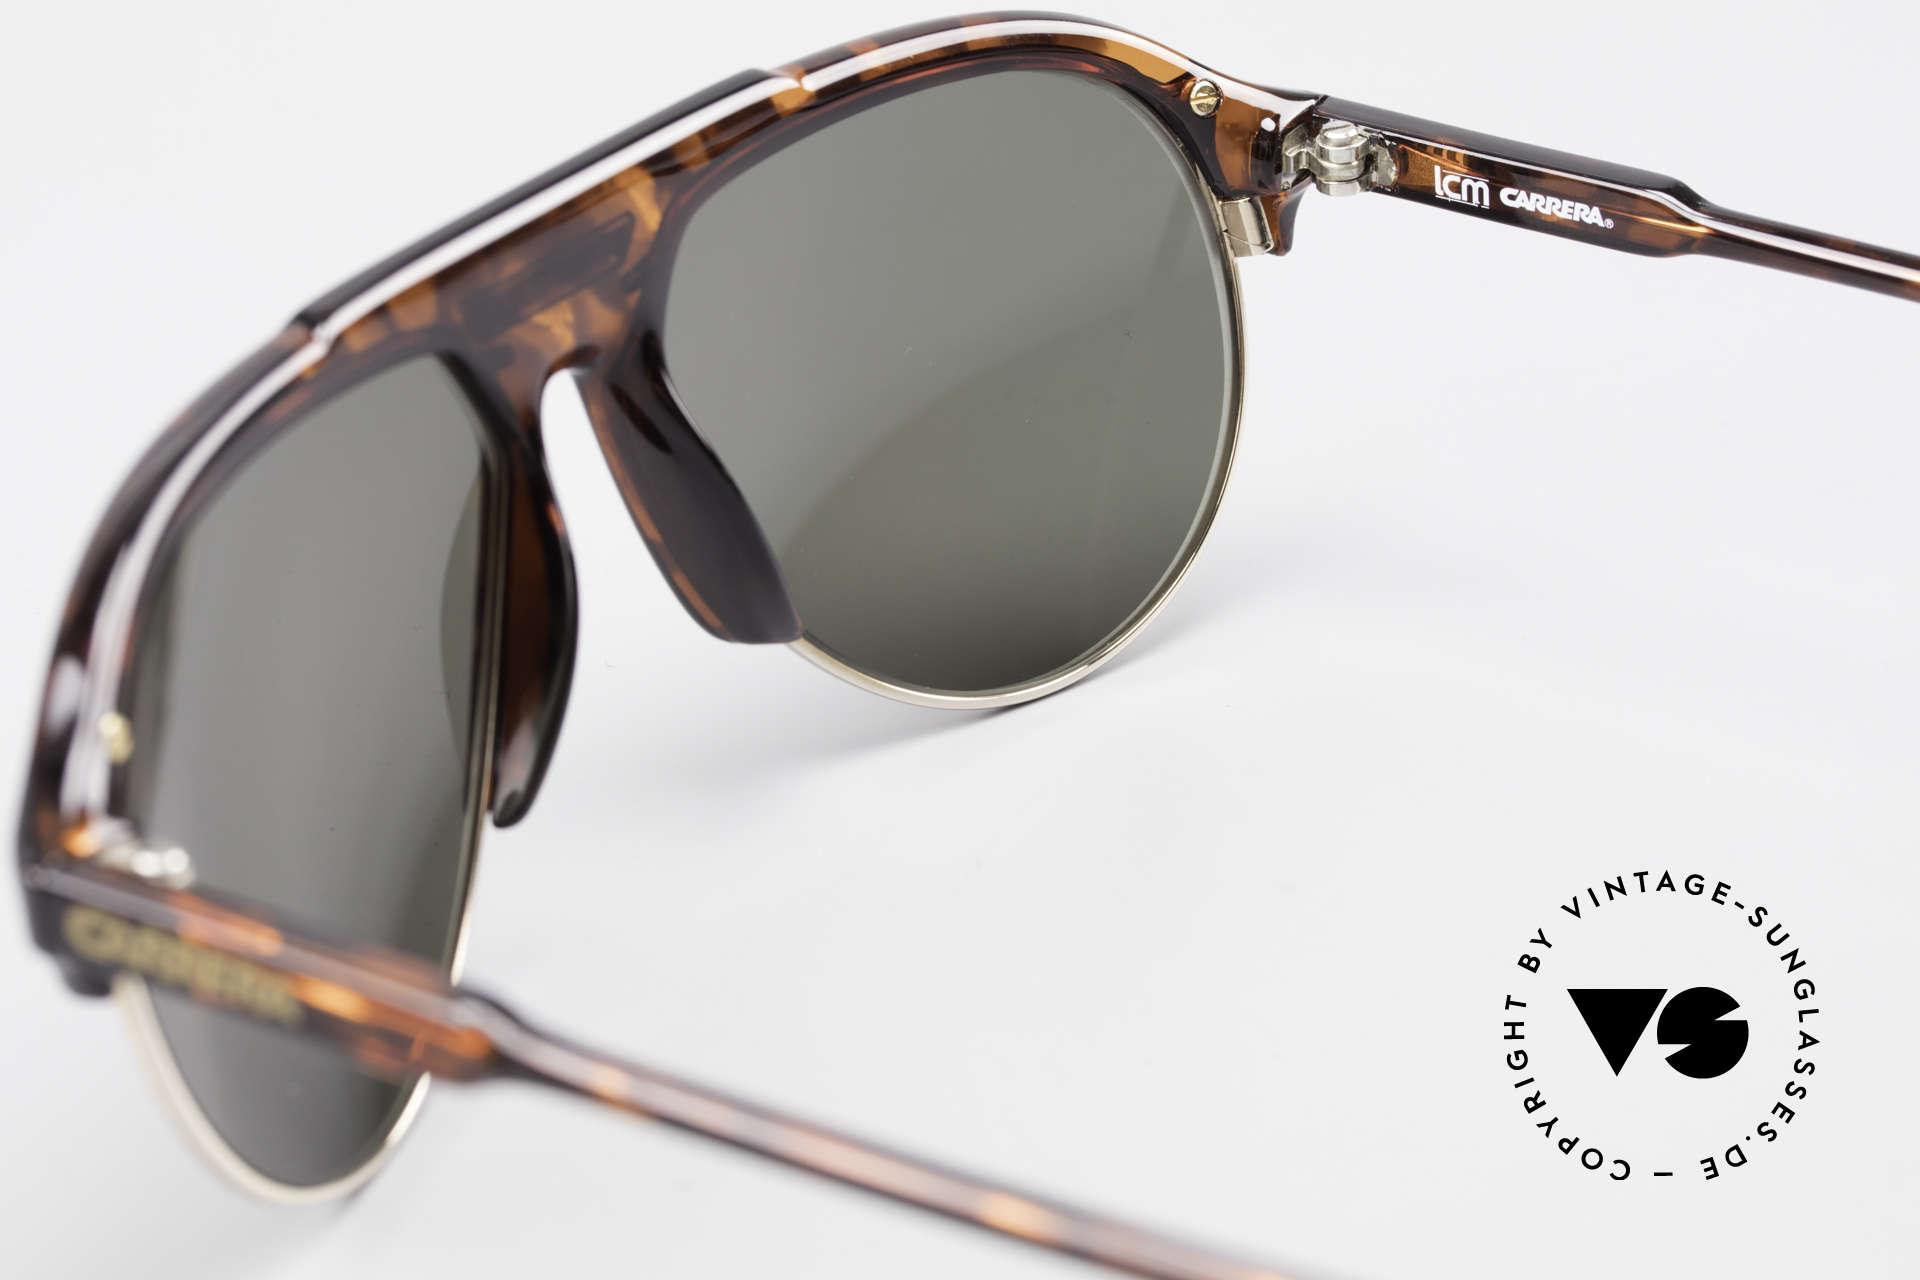 Carrera 5433 Aviator Sunglasses Men 90's, sun lenses could be replaced with prescription lenses, Made for Men